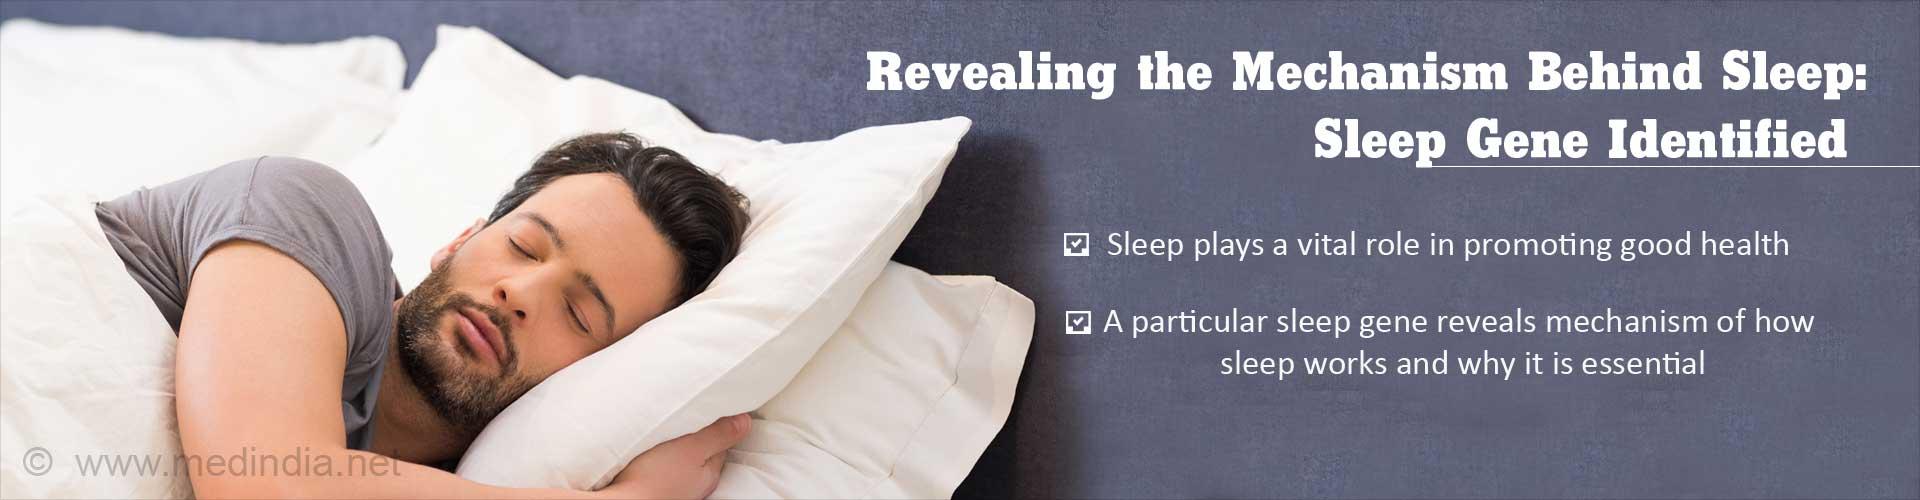 Revealing the mechanism behind sleep: sleep gene identified - Sleep plays a vital role in promoting good health - A particular sleep gene reveals mechanism of how sleep works and why it is essential